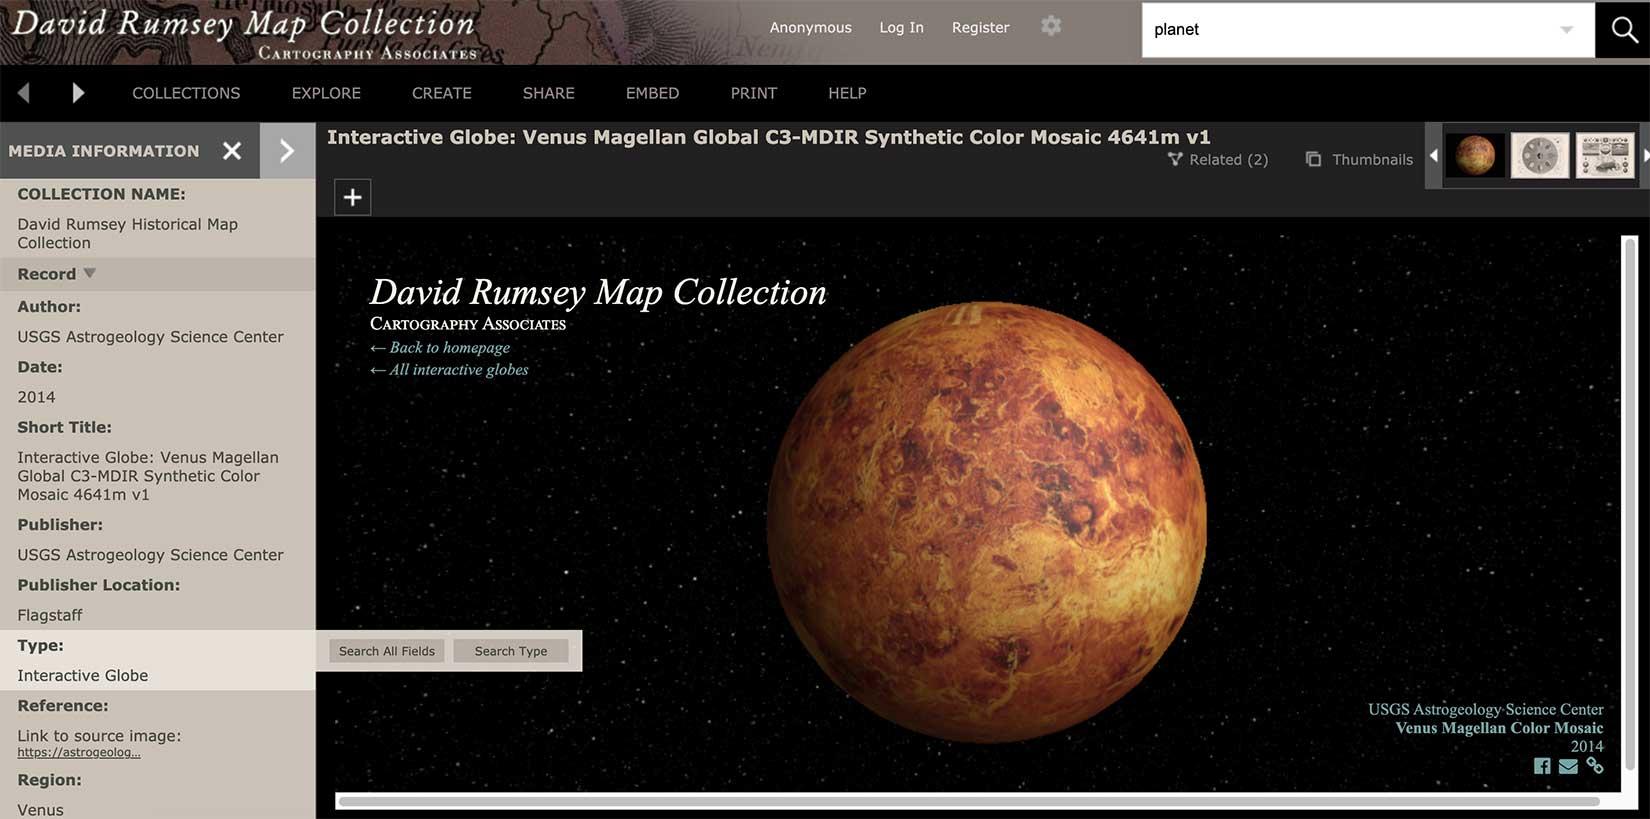 venus-planetary-david-rumsey